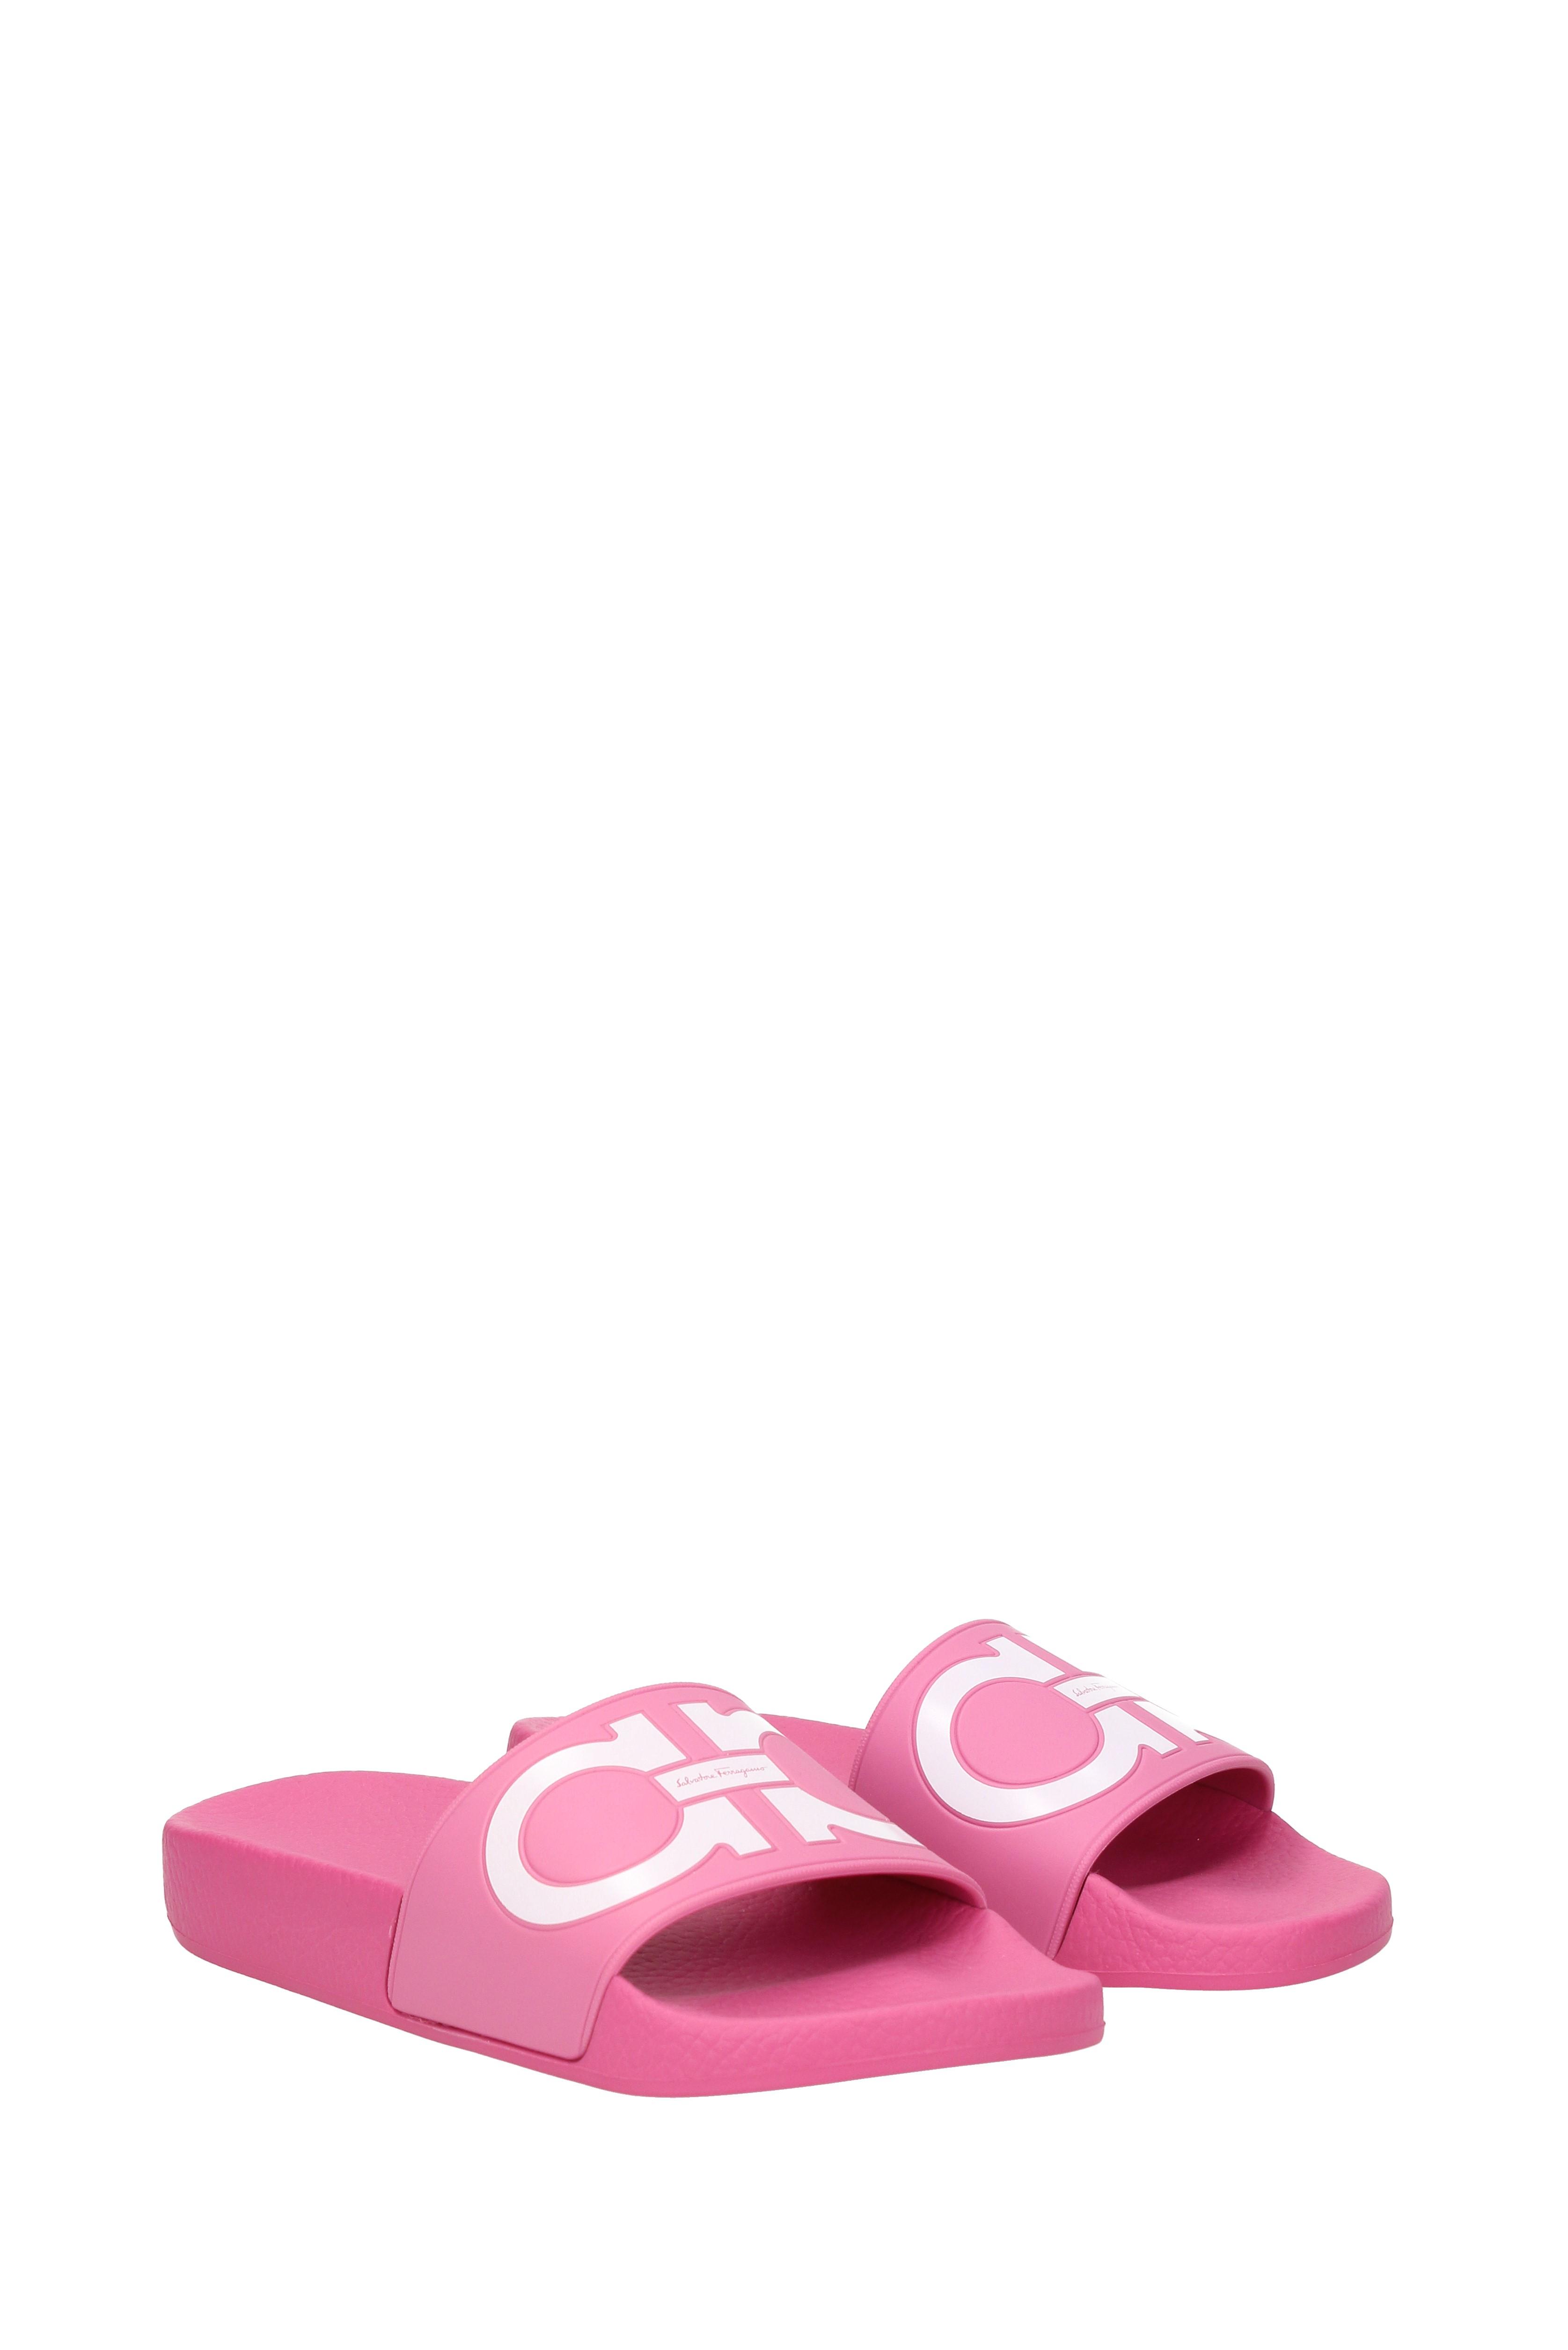 Flip-Flops Flip-Flops Flip-Flops und Holzschuhe Salvatore Ferragamo Damen - Gummi (DamensGROOVE06546) 8b9ff1